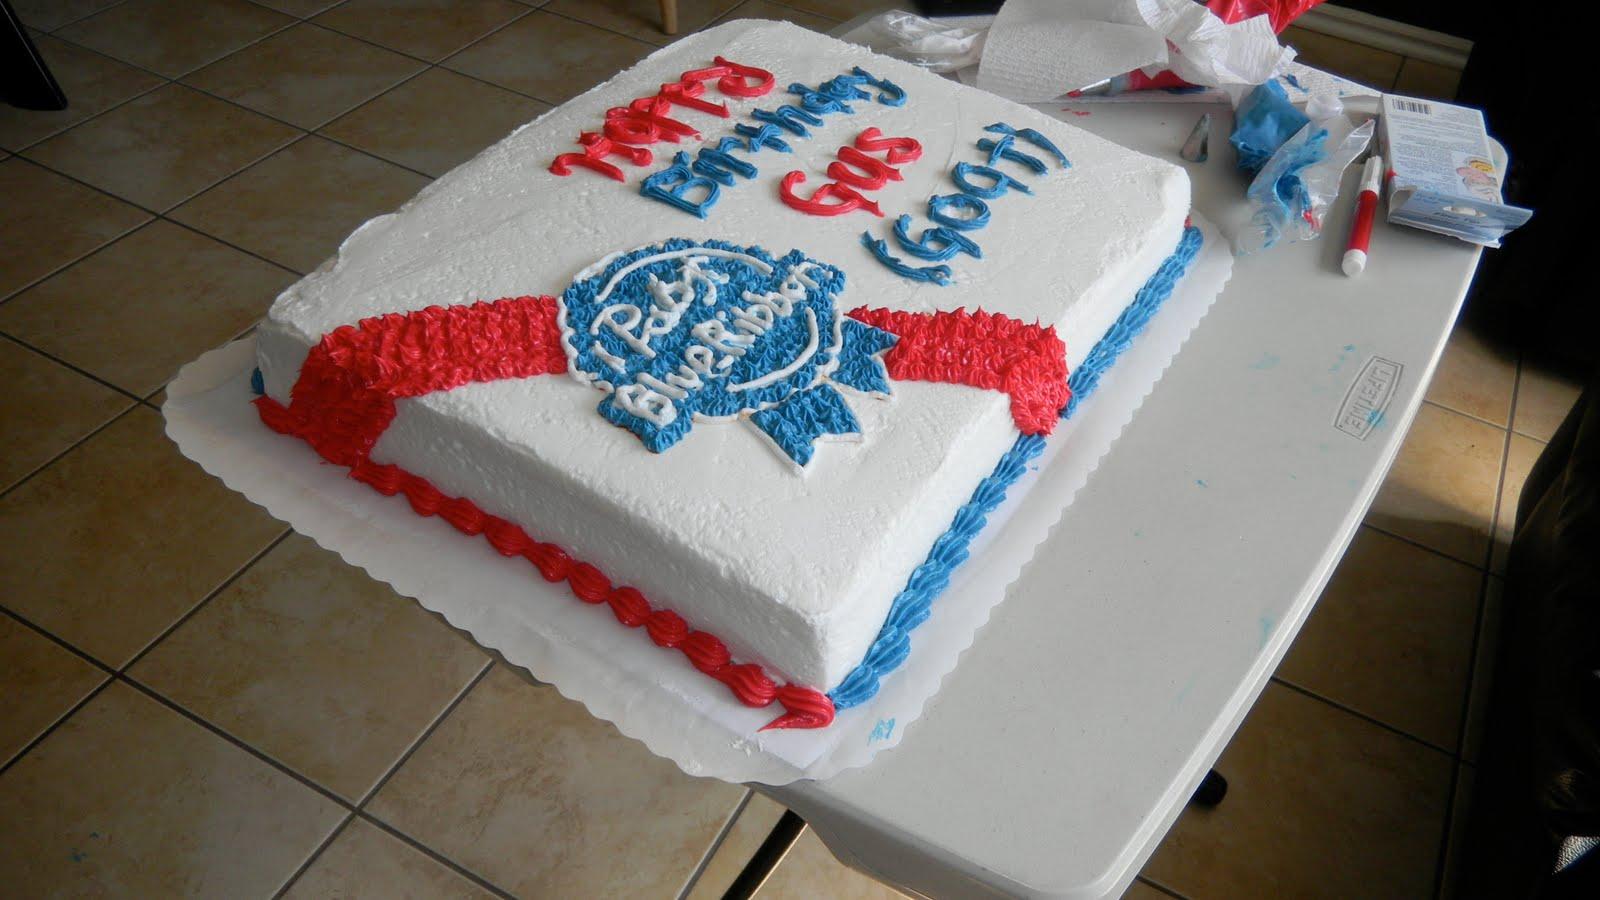 Beer Birthday Cake Ideas Beer birthday cake